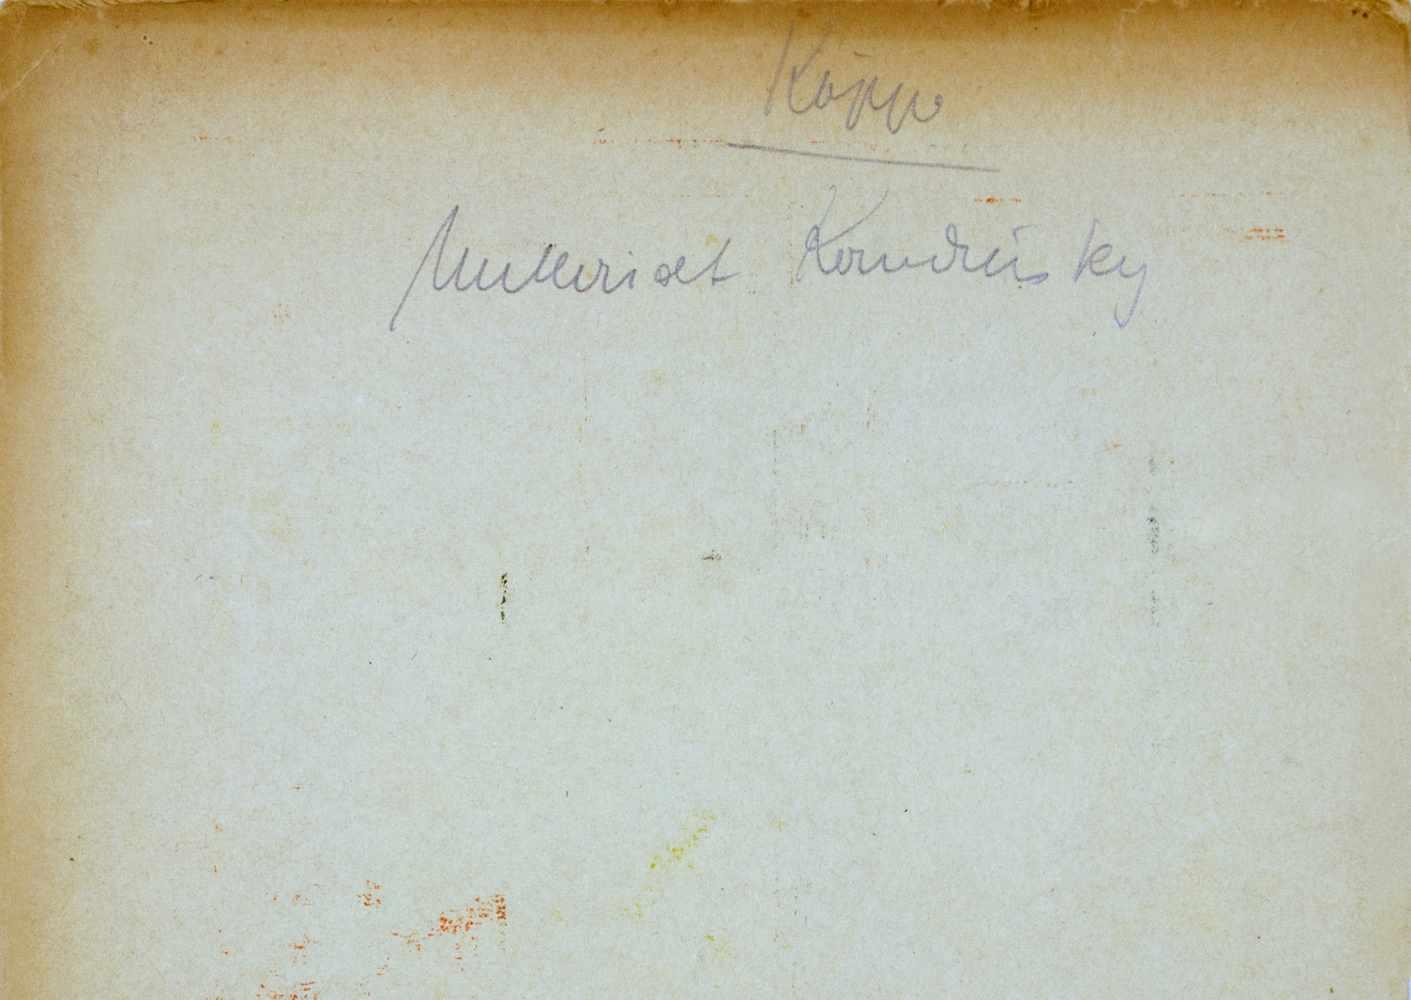 Bauhaus - Walter Köppe. Unterricht Kandinsky. Farbspektren. 28 collagierte Temperafarbflächen auf - Image 2 of 2